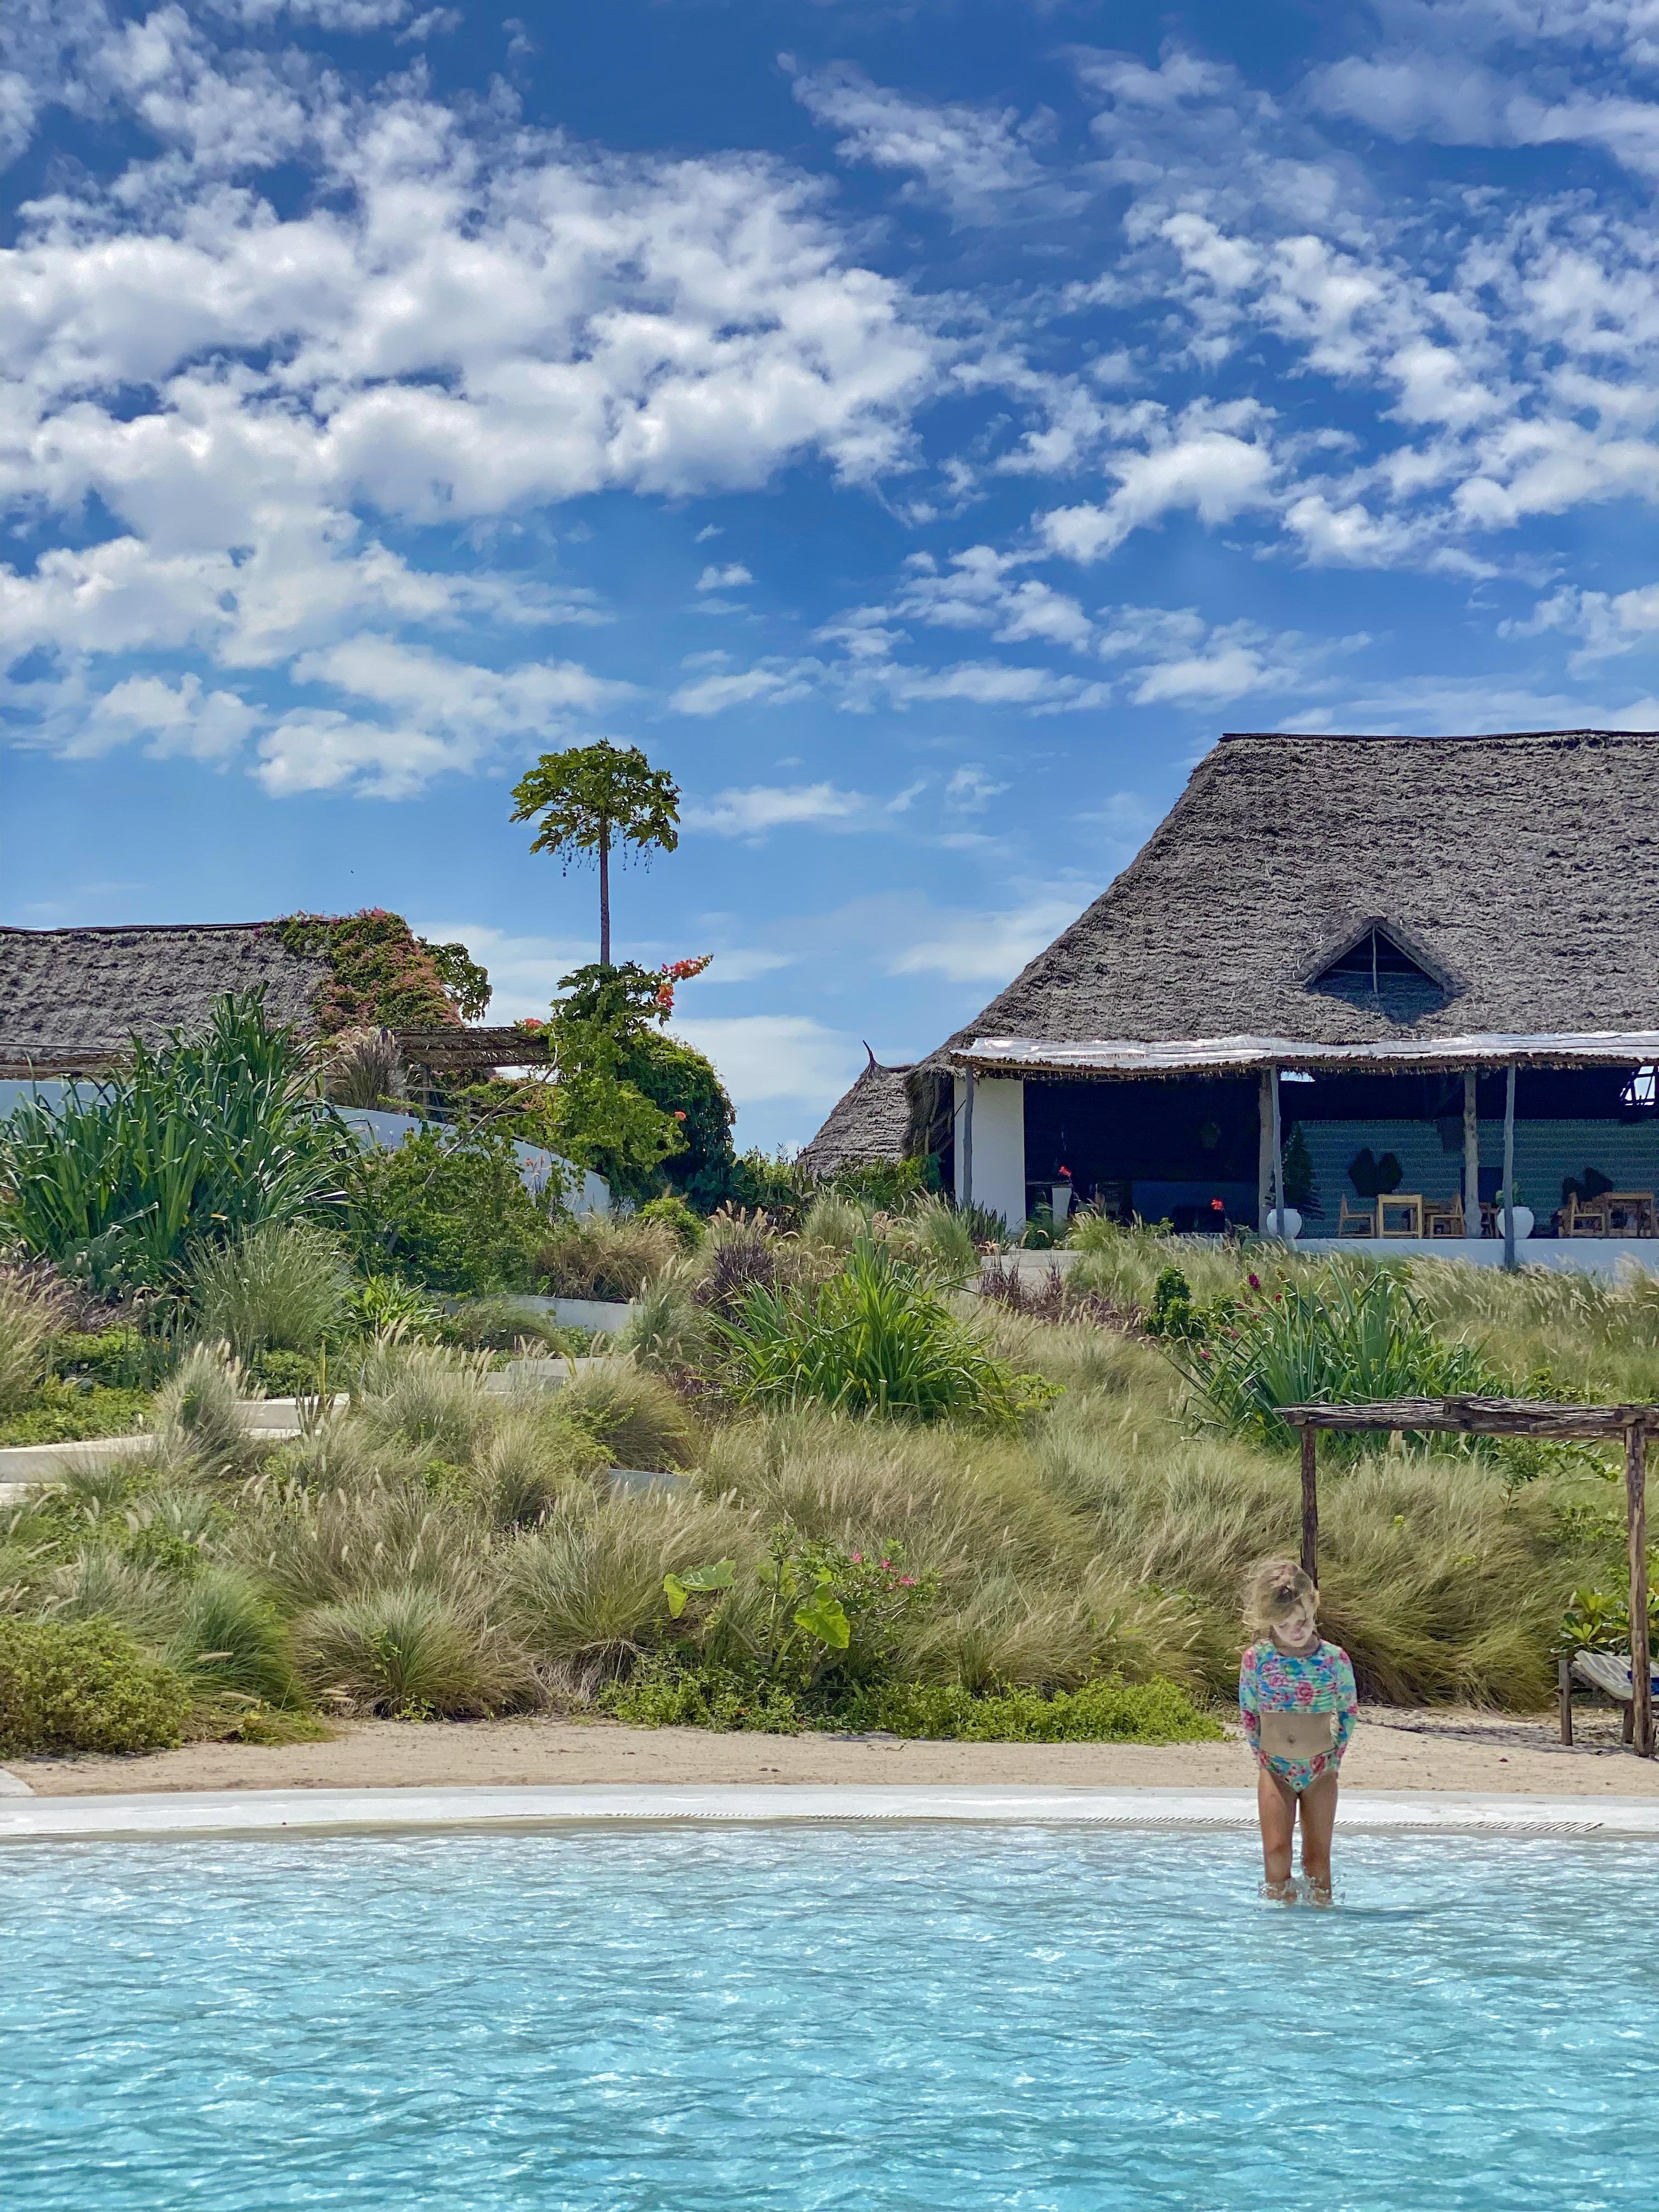 onde ficar zanzibar , dormir em zanzibar , melhores hotéis zanzibar